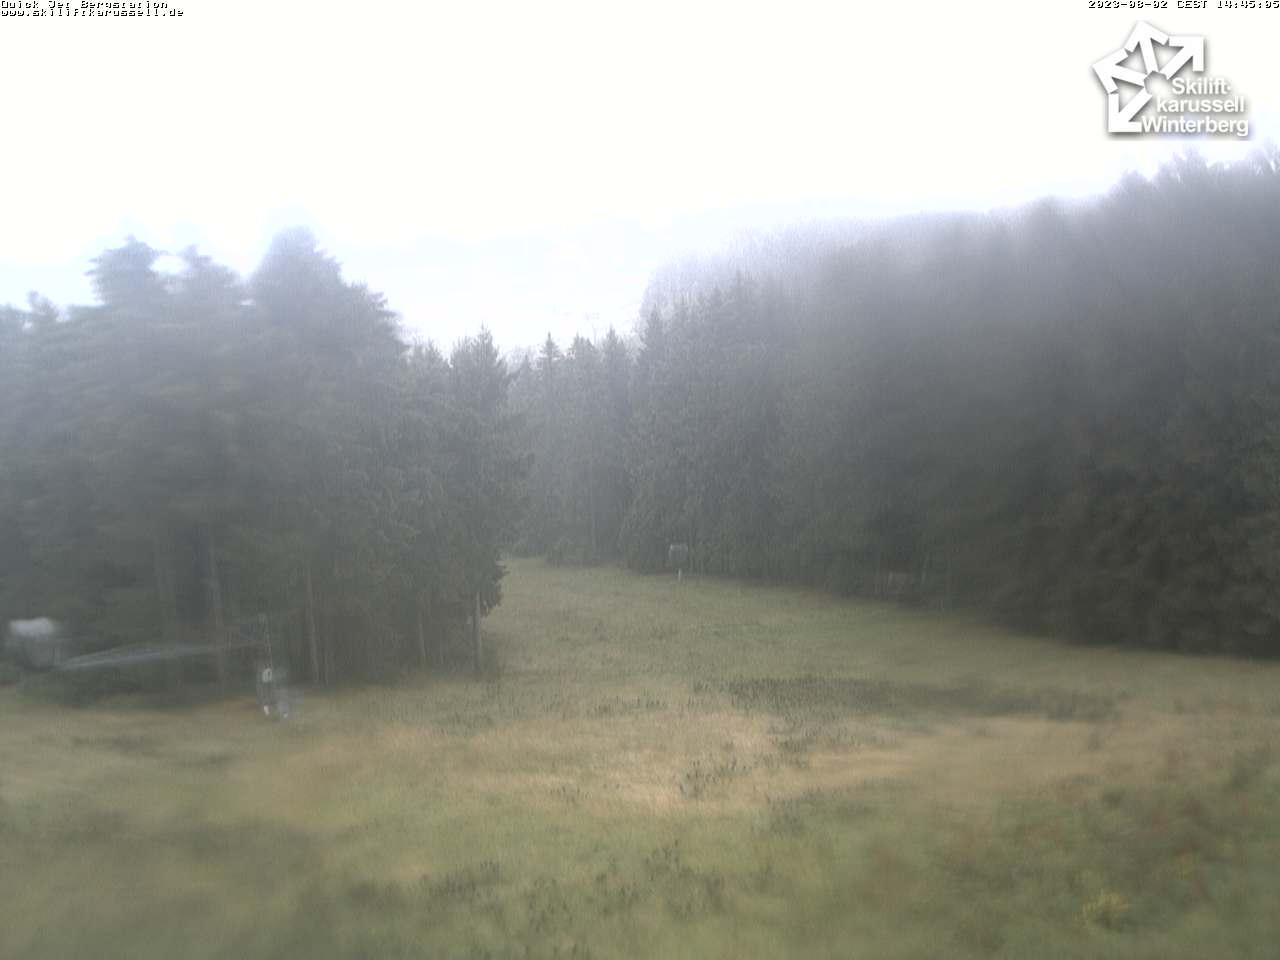 Webcam Winterberg - Skilift Quick Jet